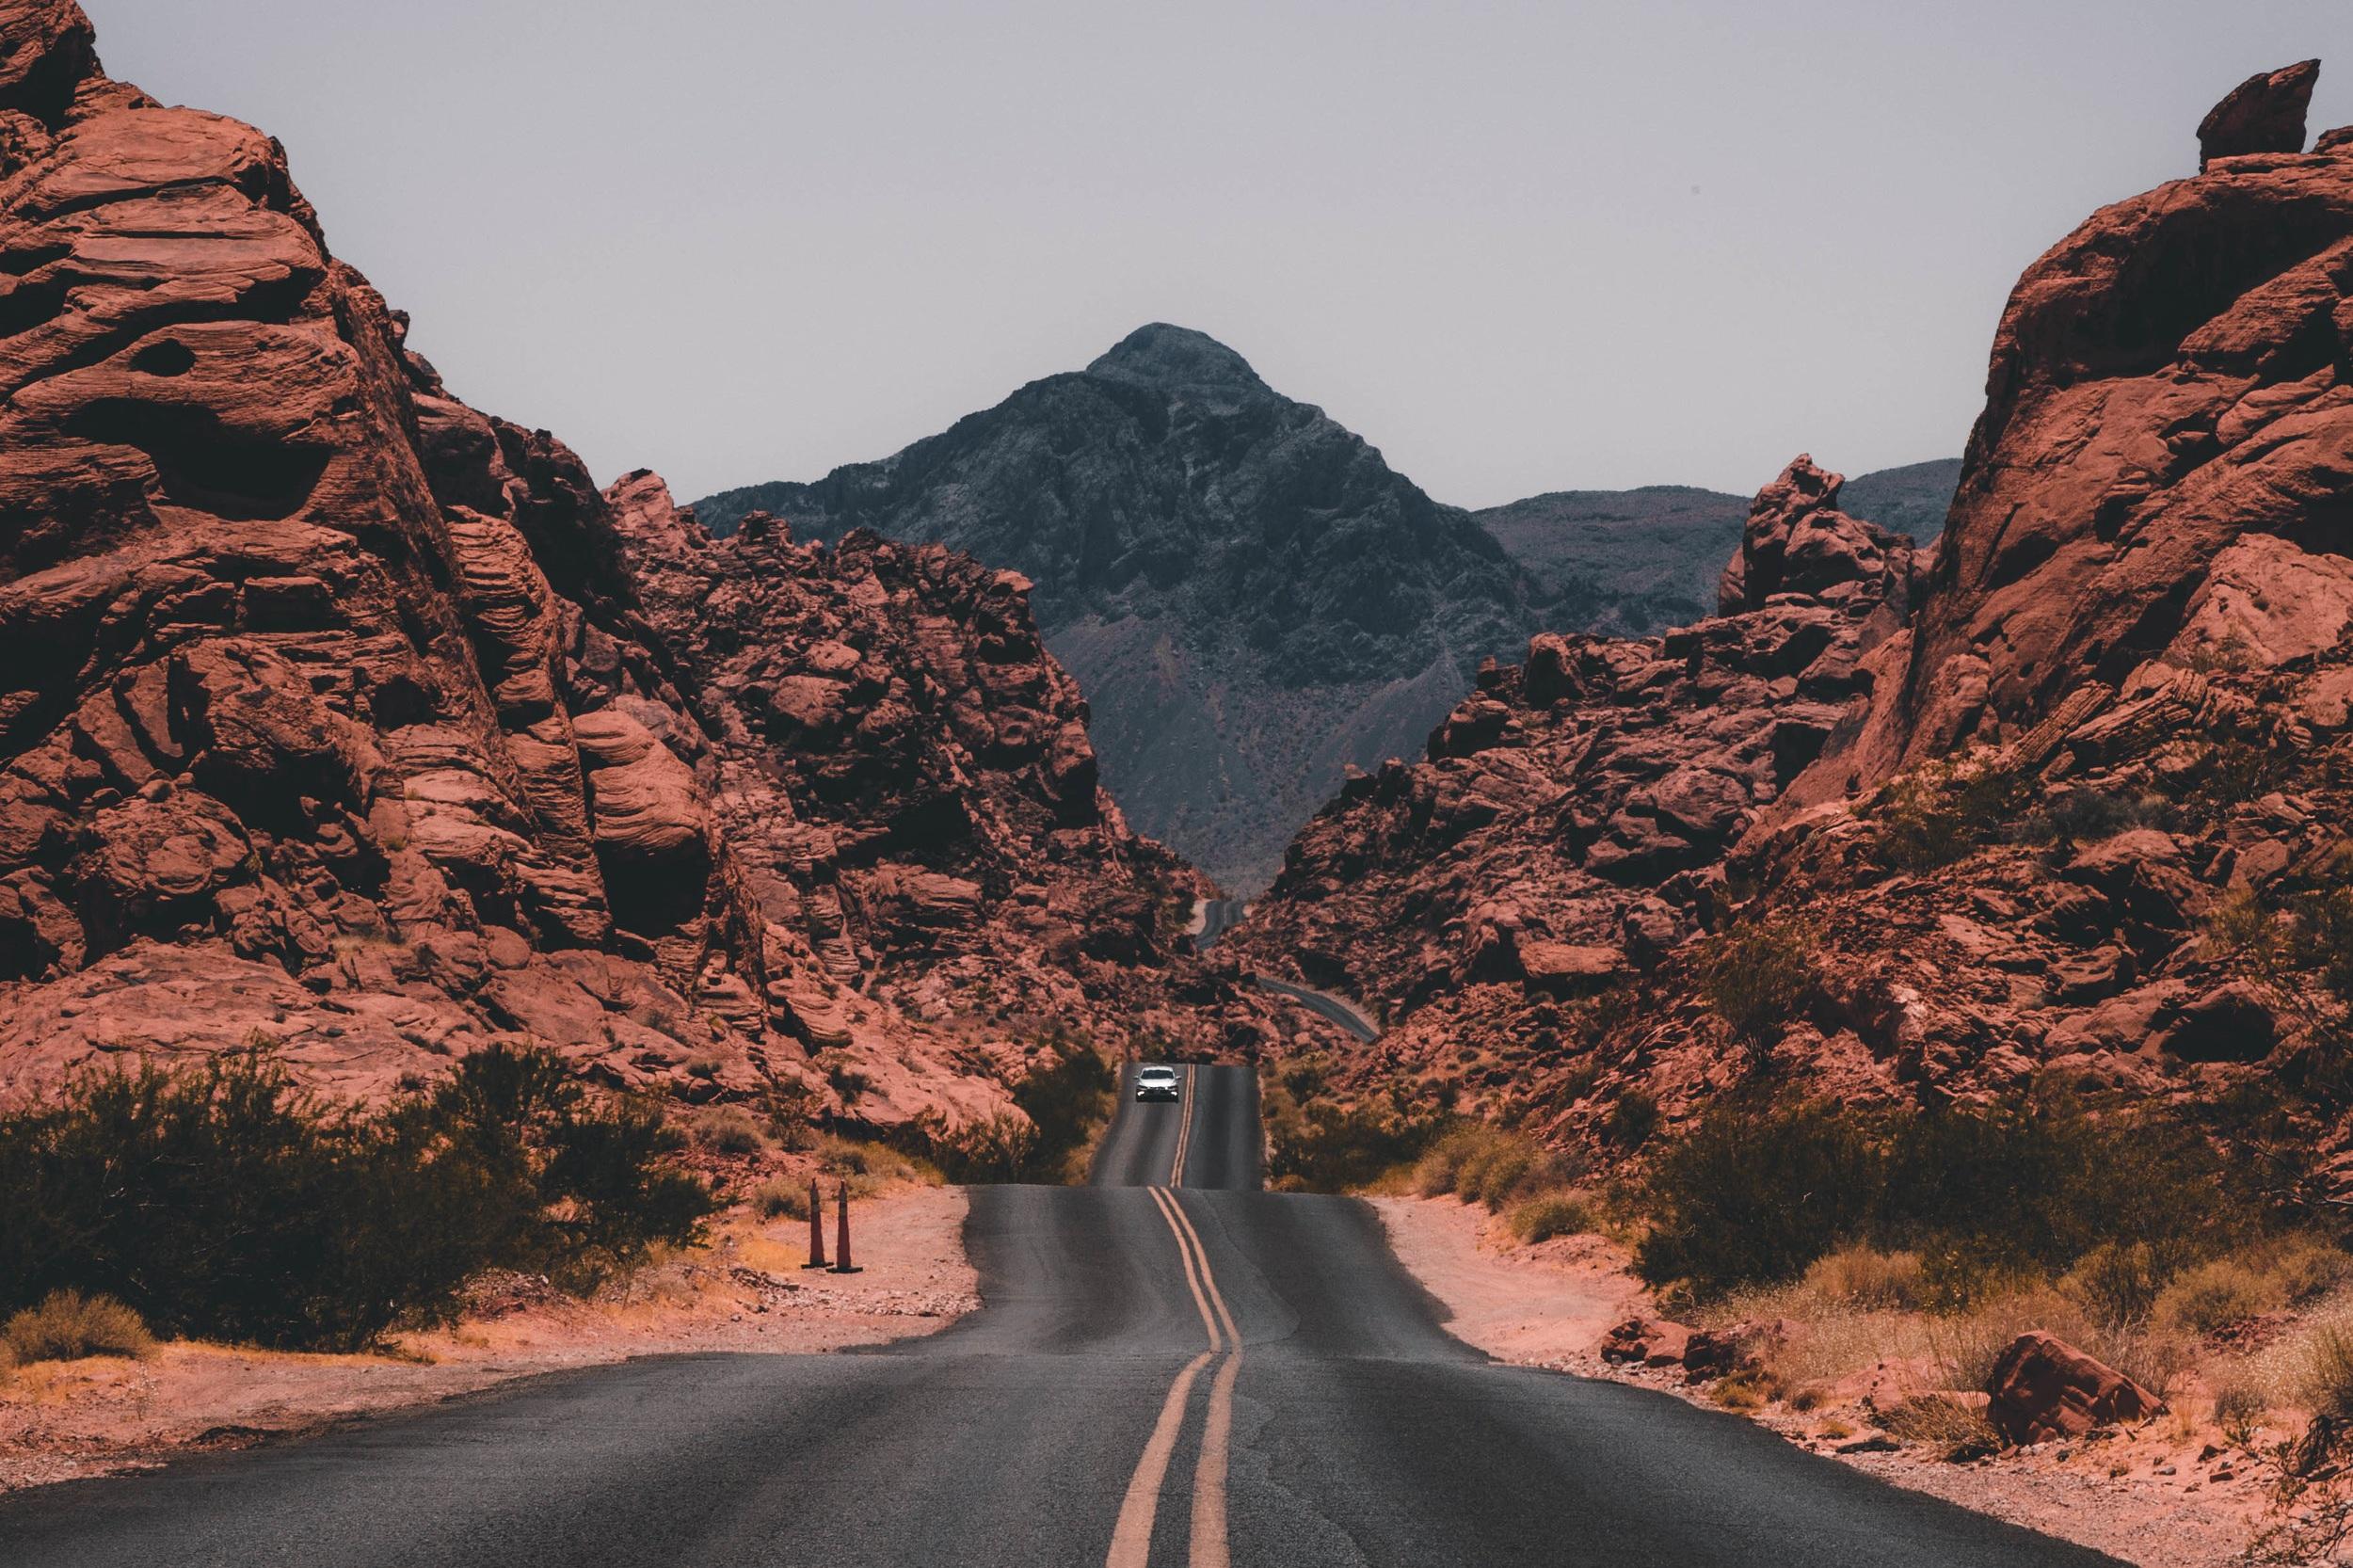 NEVADA - TRAVEL GUIDE